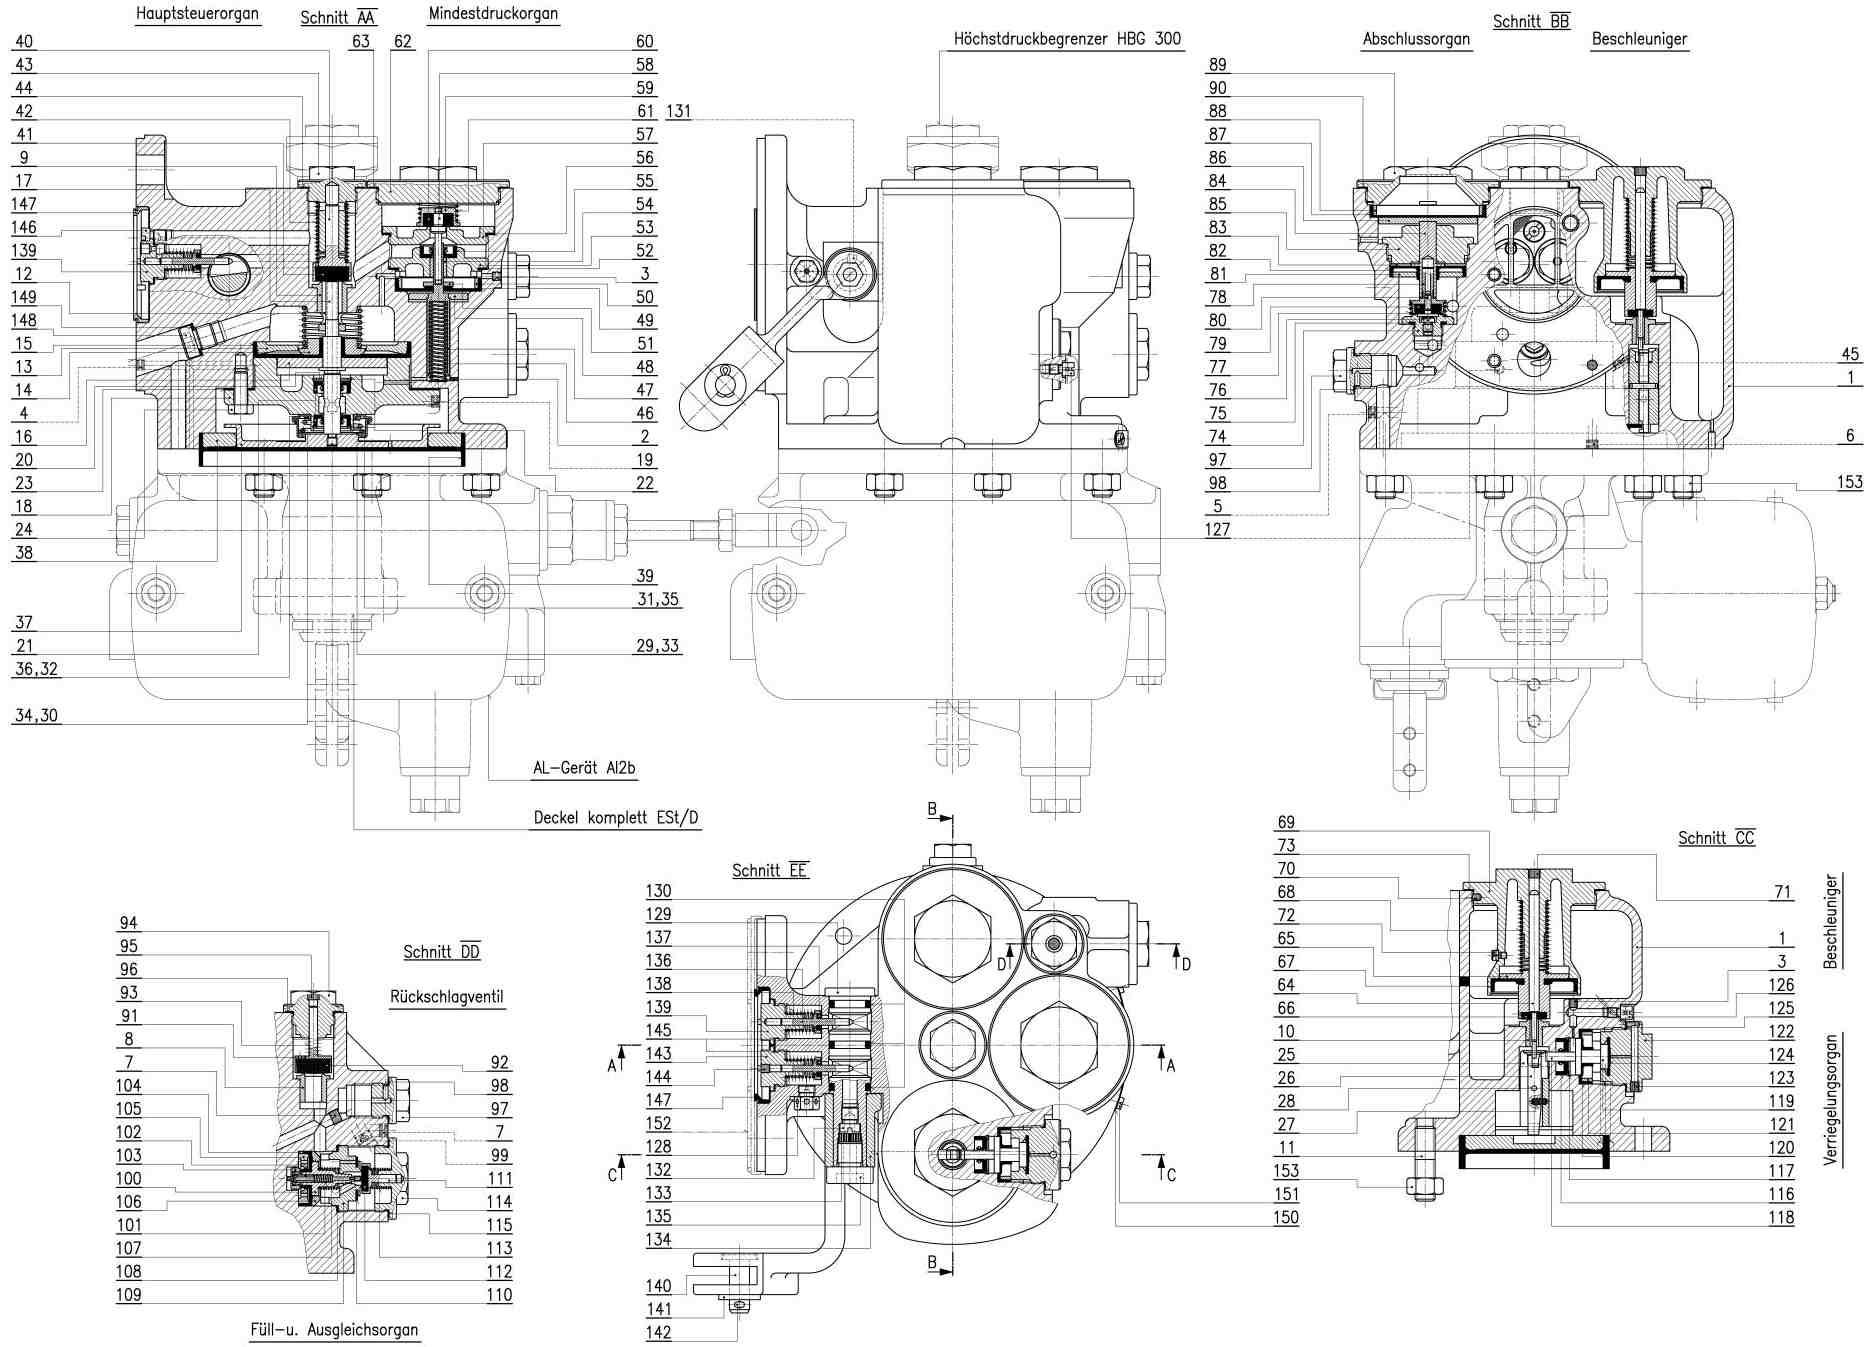 Spare Parts List For Steuerventil Type Est 3f Hbg 300 Est3f Type I B Standard Sheet N 003 002